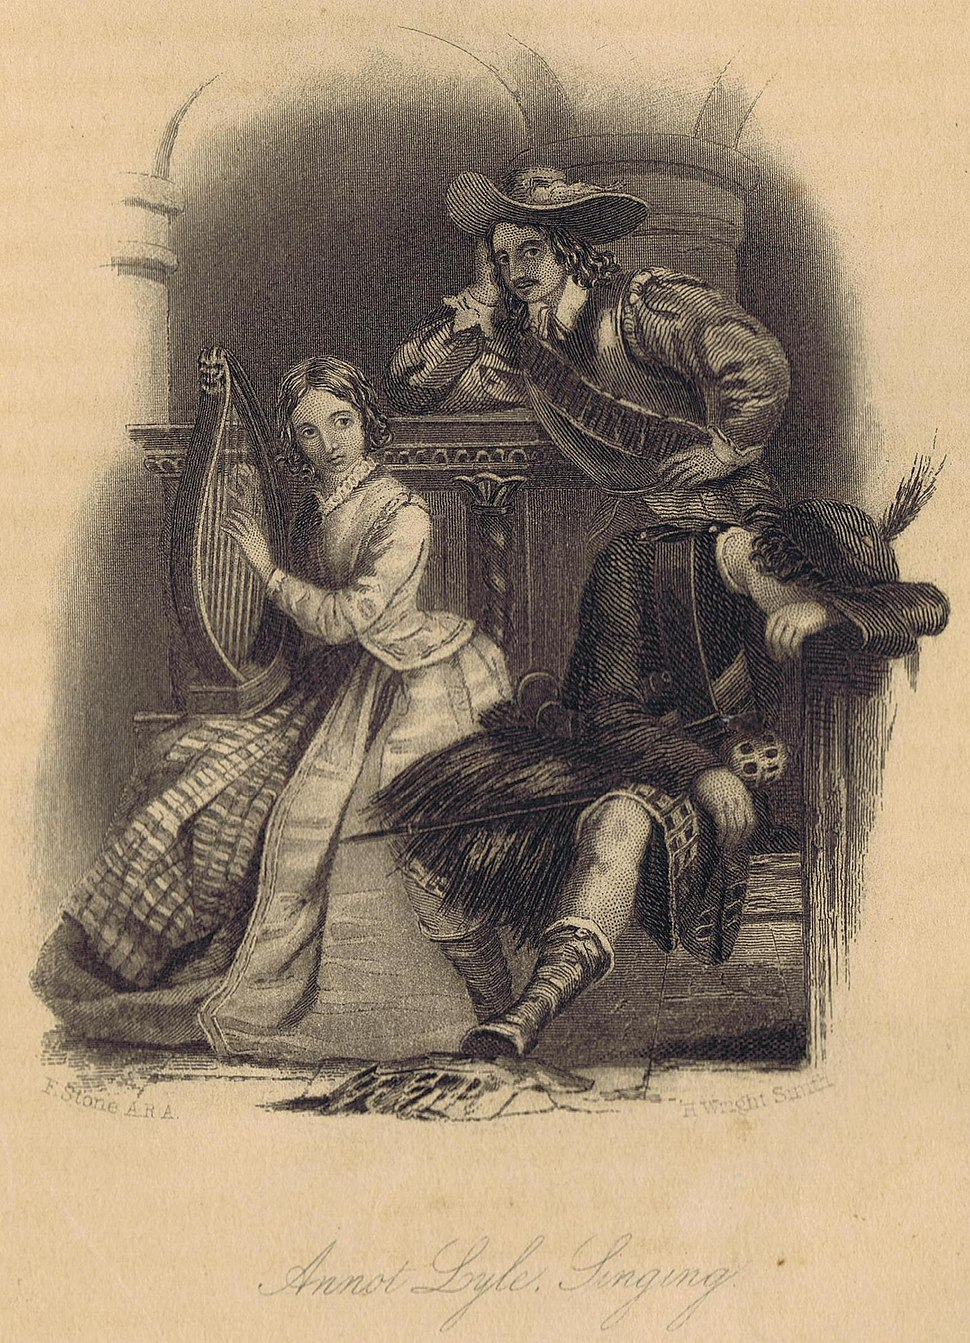 Walter Scott Legend of Montrose Illustration